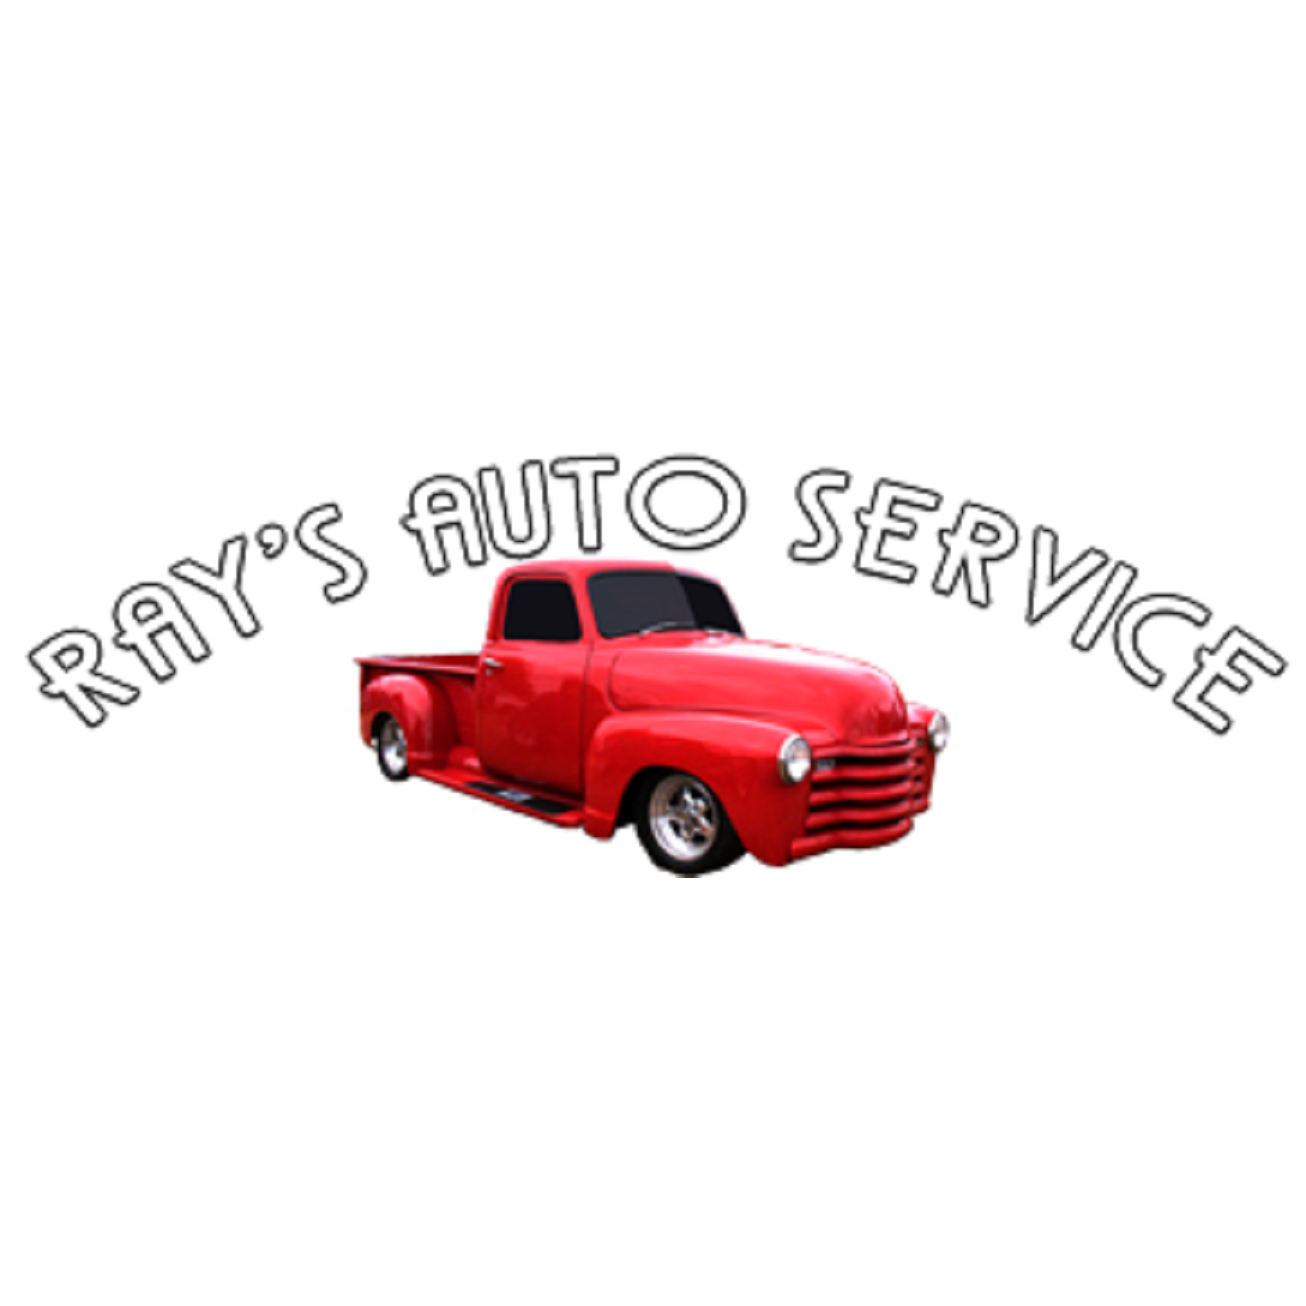 Ray's Auto Service image 1